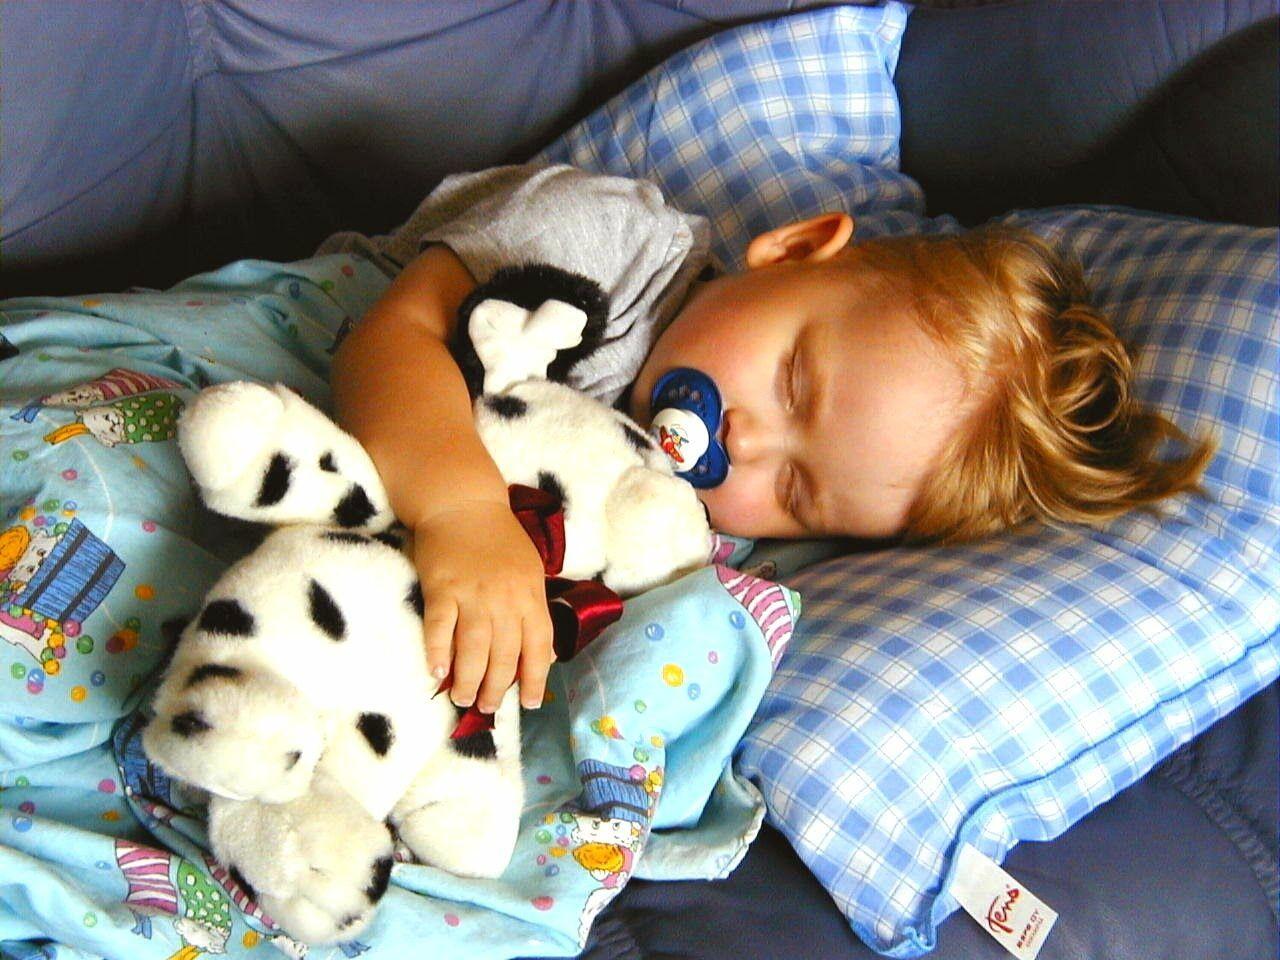 Baby Boy Sleeping Thats My Boy  Hugs<3